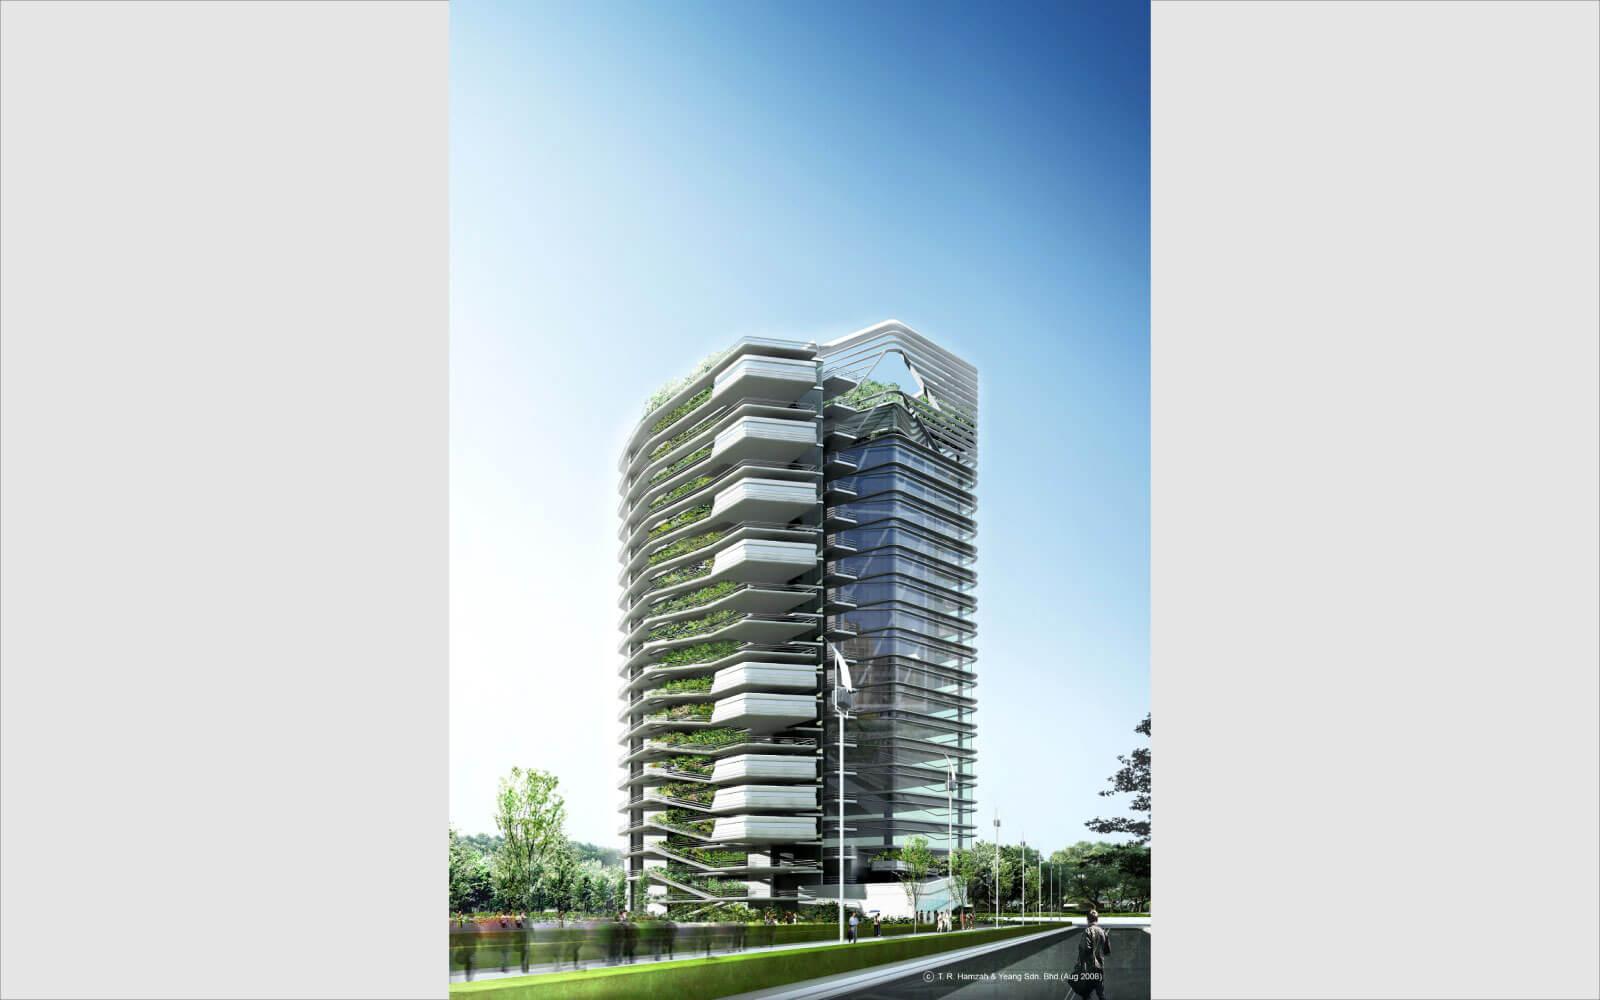 Image 3 of Spire Edge full green architect catalouge